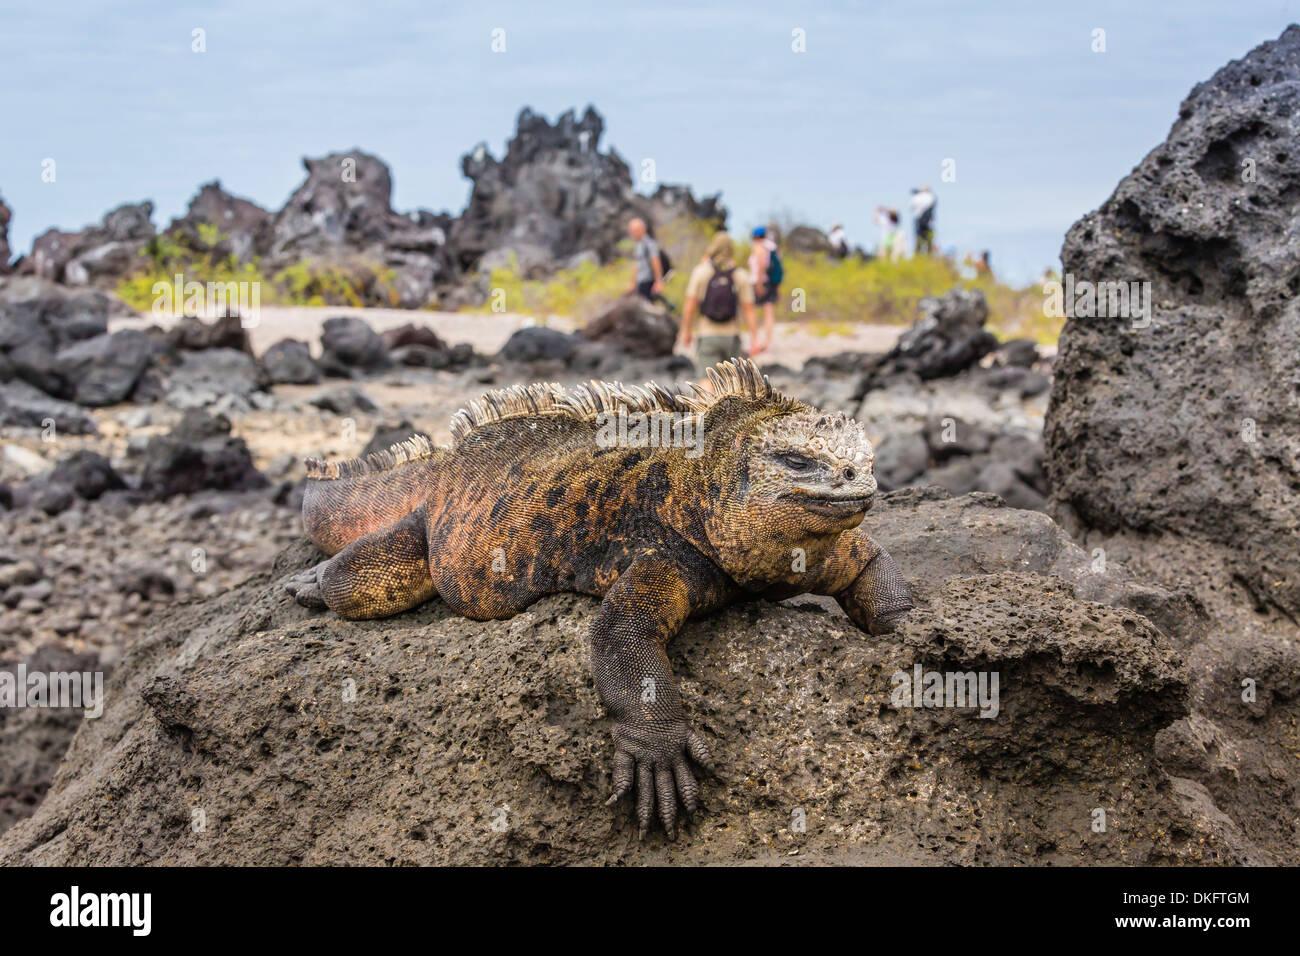 Galapagos marine Iguana (Amblyrhynchus Cristatus) sonnen sich in UNESCO-Website, Ecuador, Galapagos-Inseln, Insel Stockbild